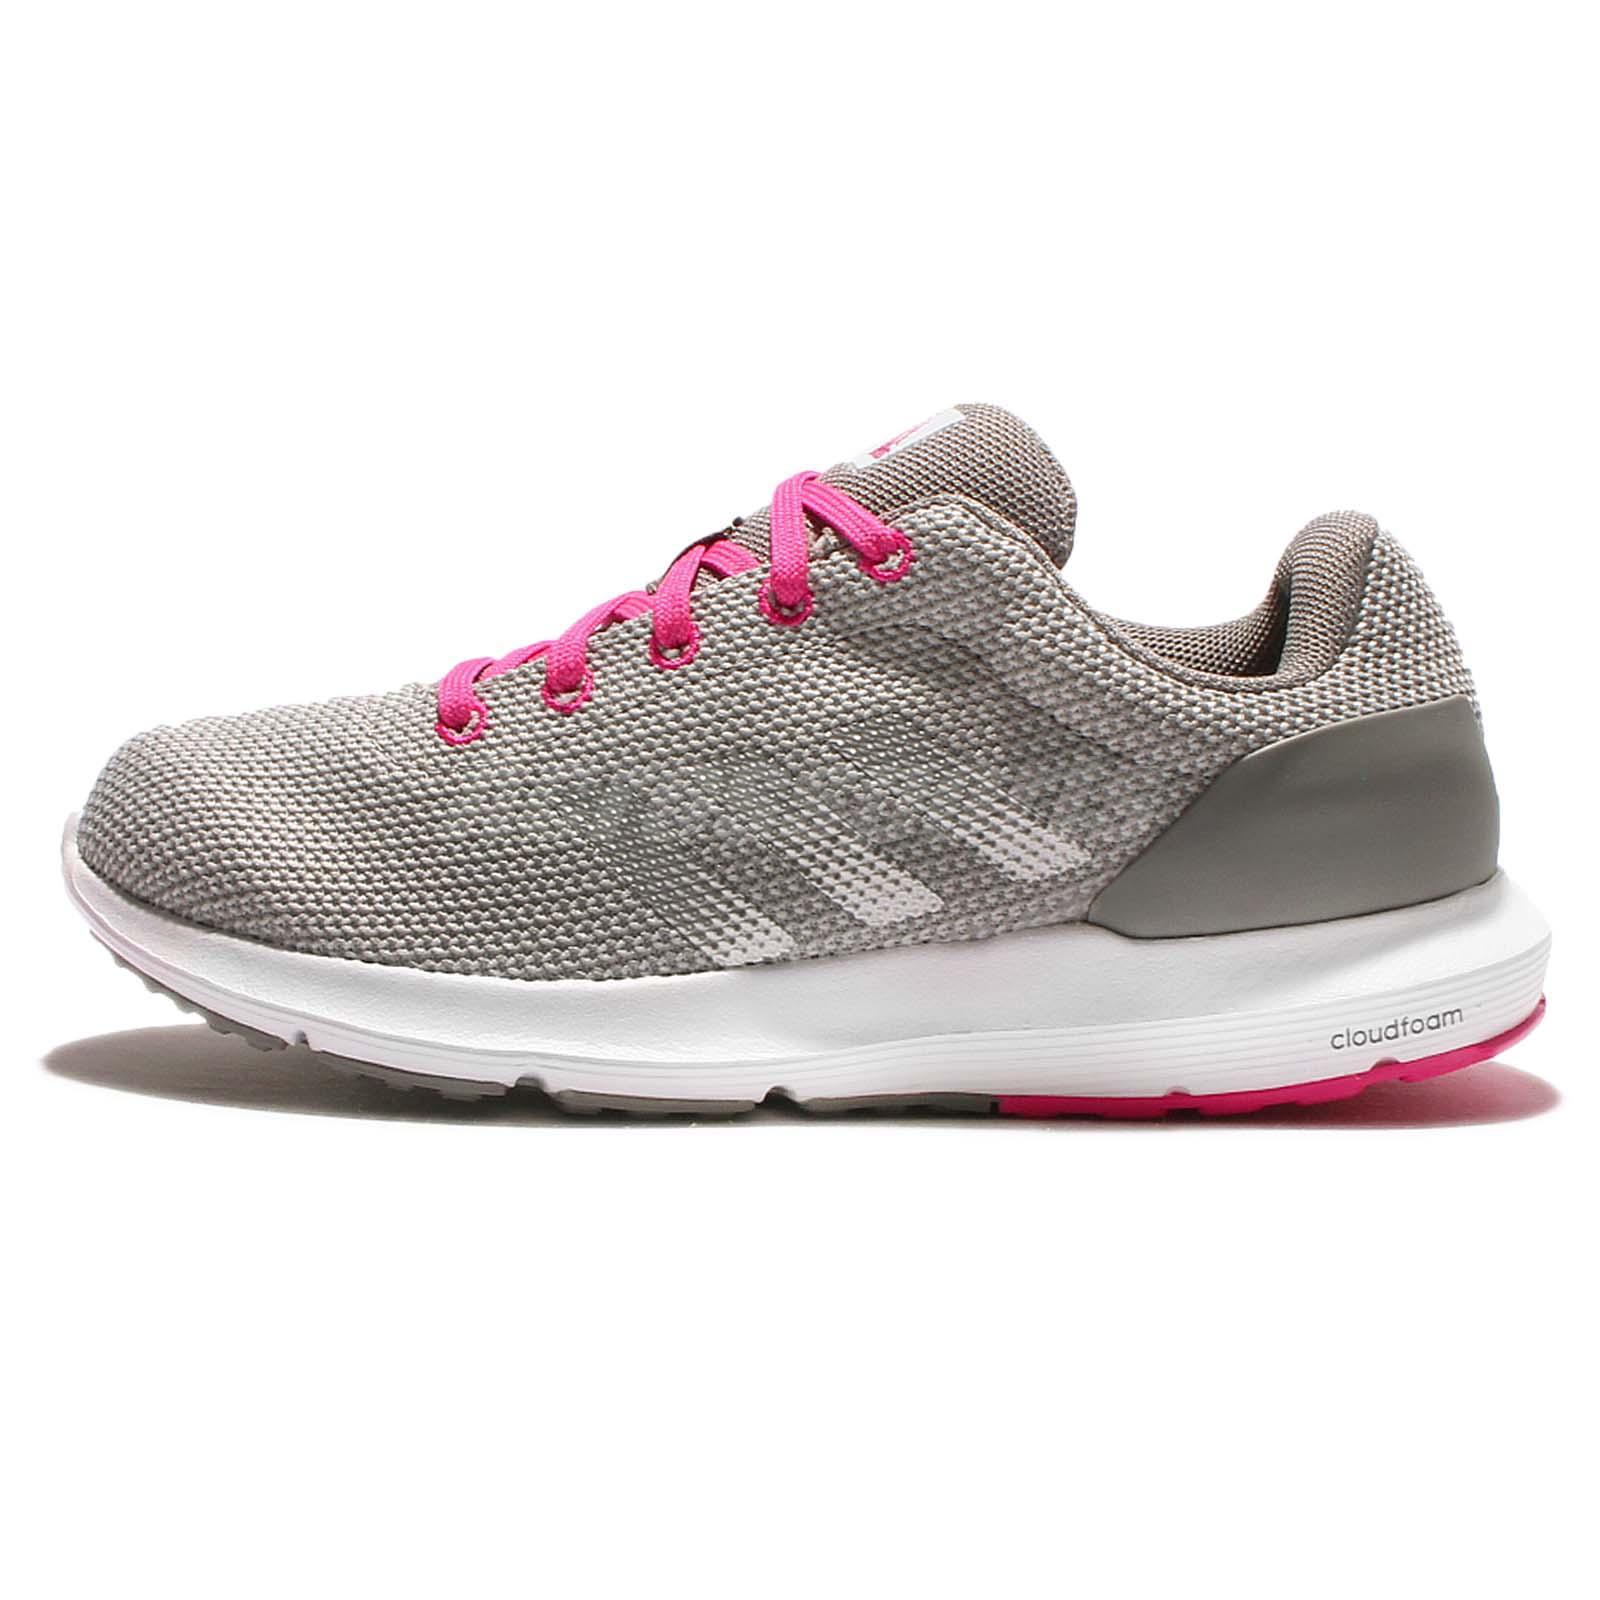 adidas cloudfoam grey pink